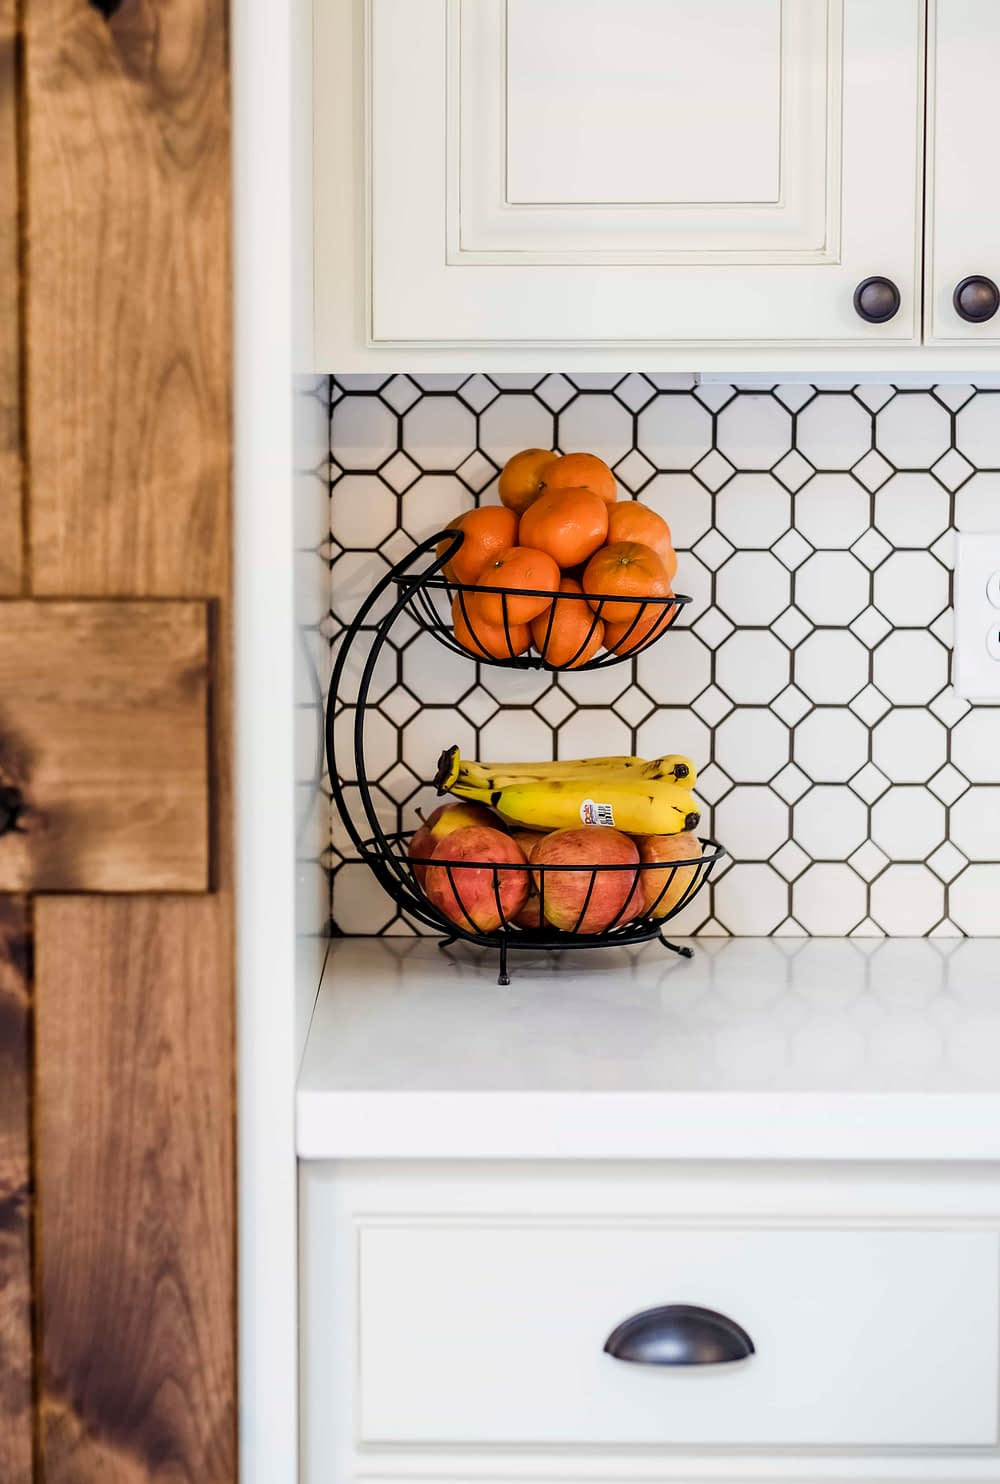 Black stacked fruit basket with oranges and bananas against white penny tile backsplash